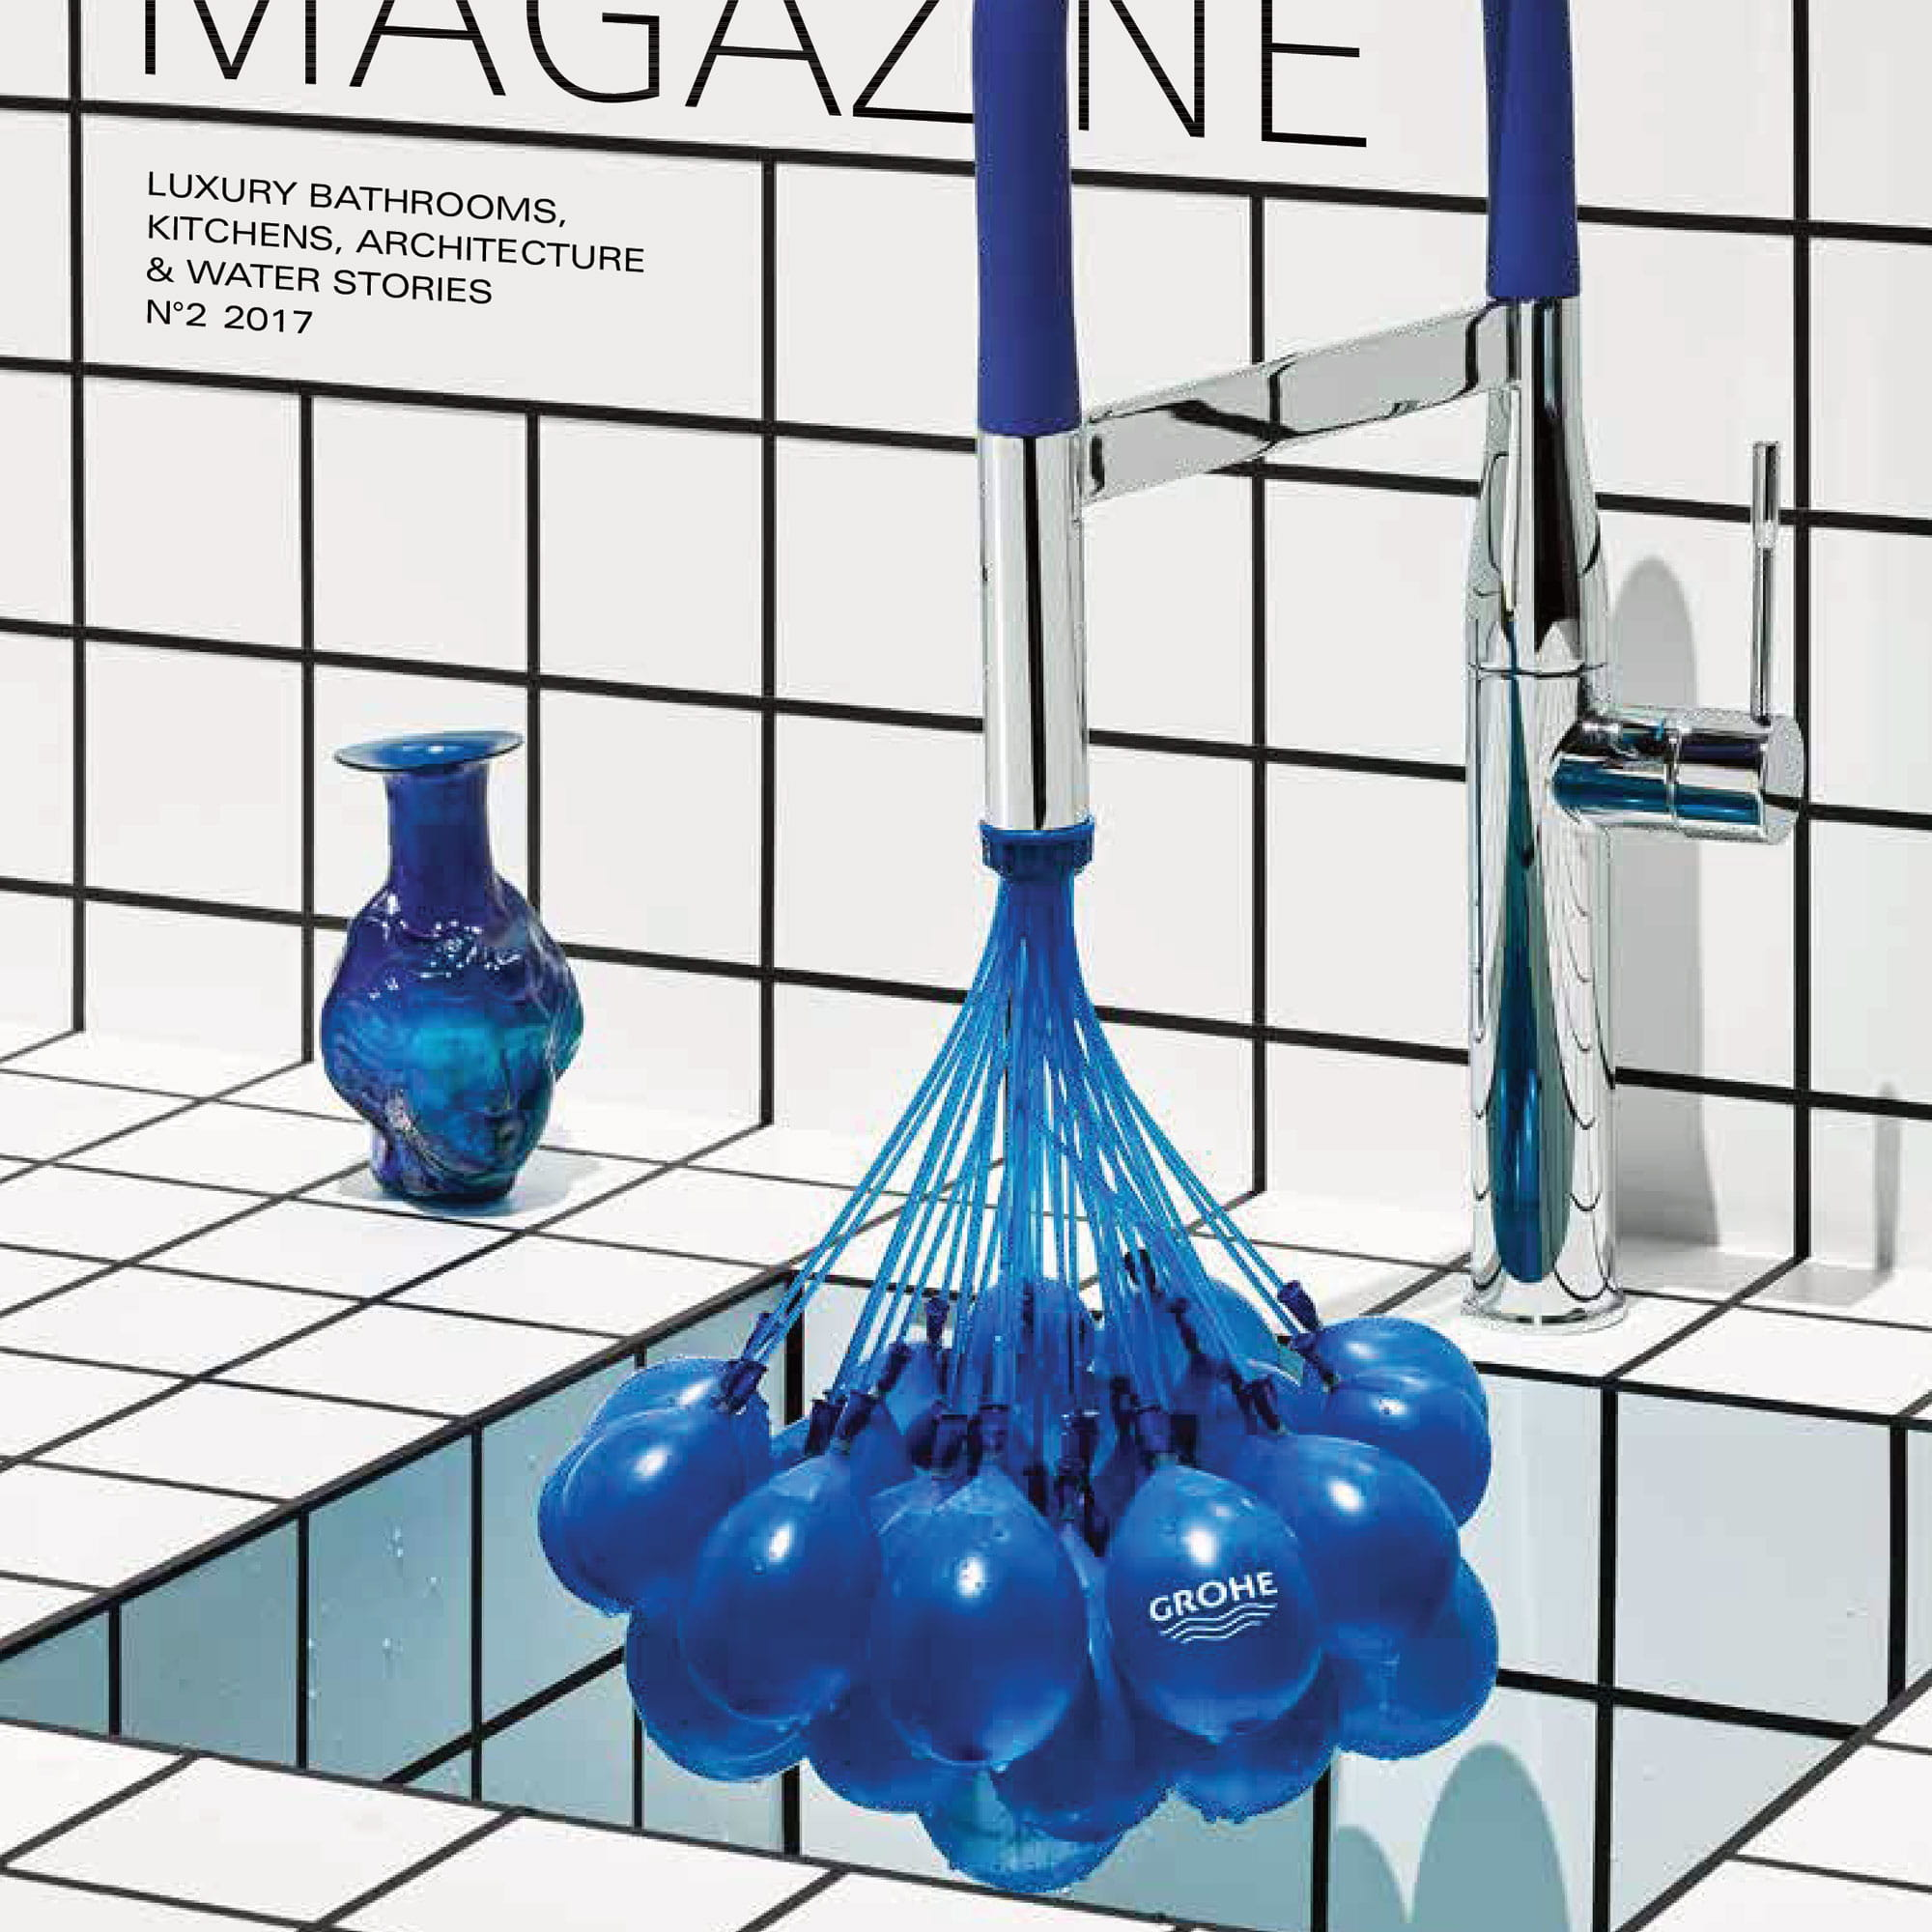 faucet filling up water ballons